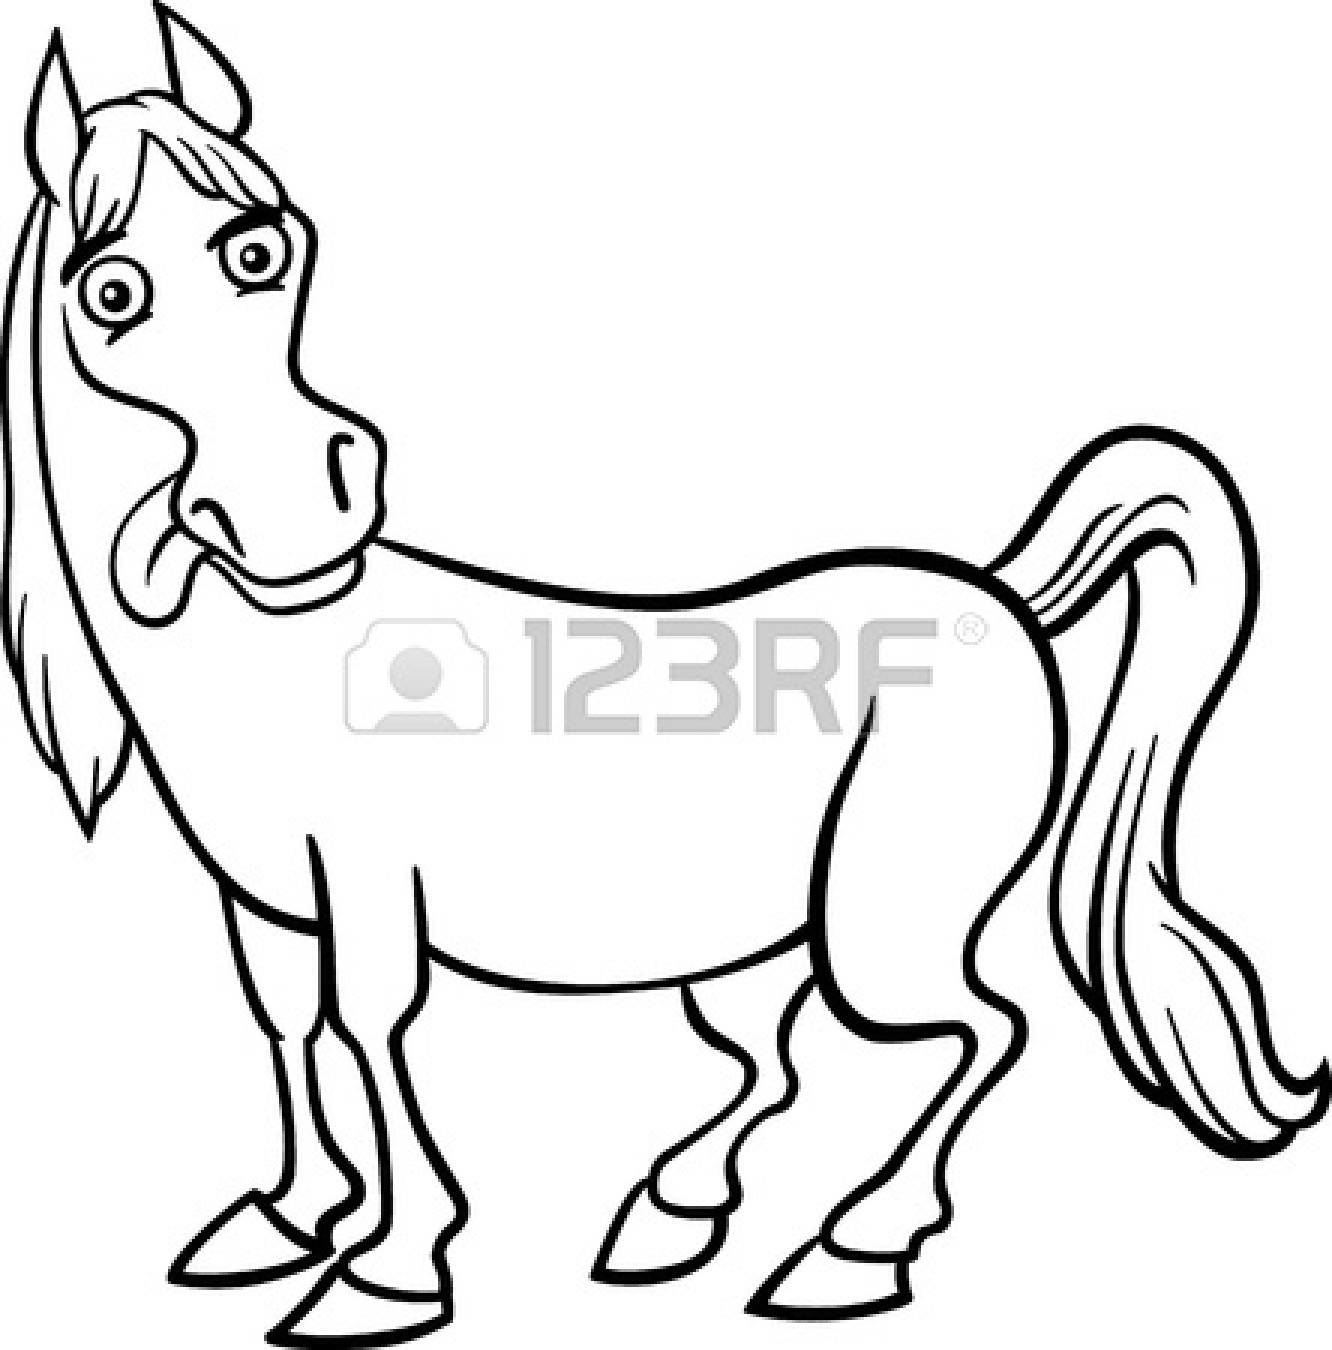 1332x1350 Farm Animal Black And White Clipart